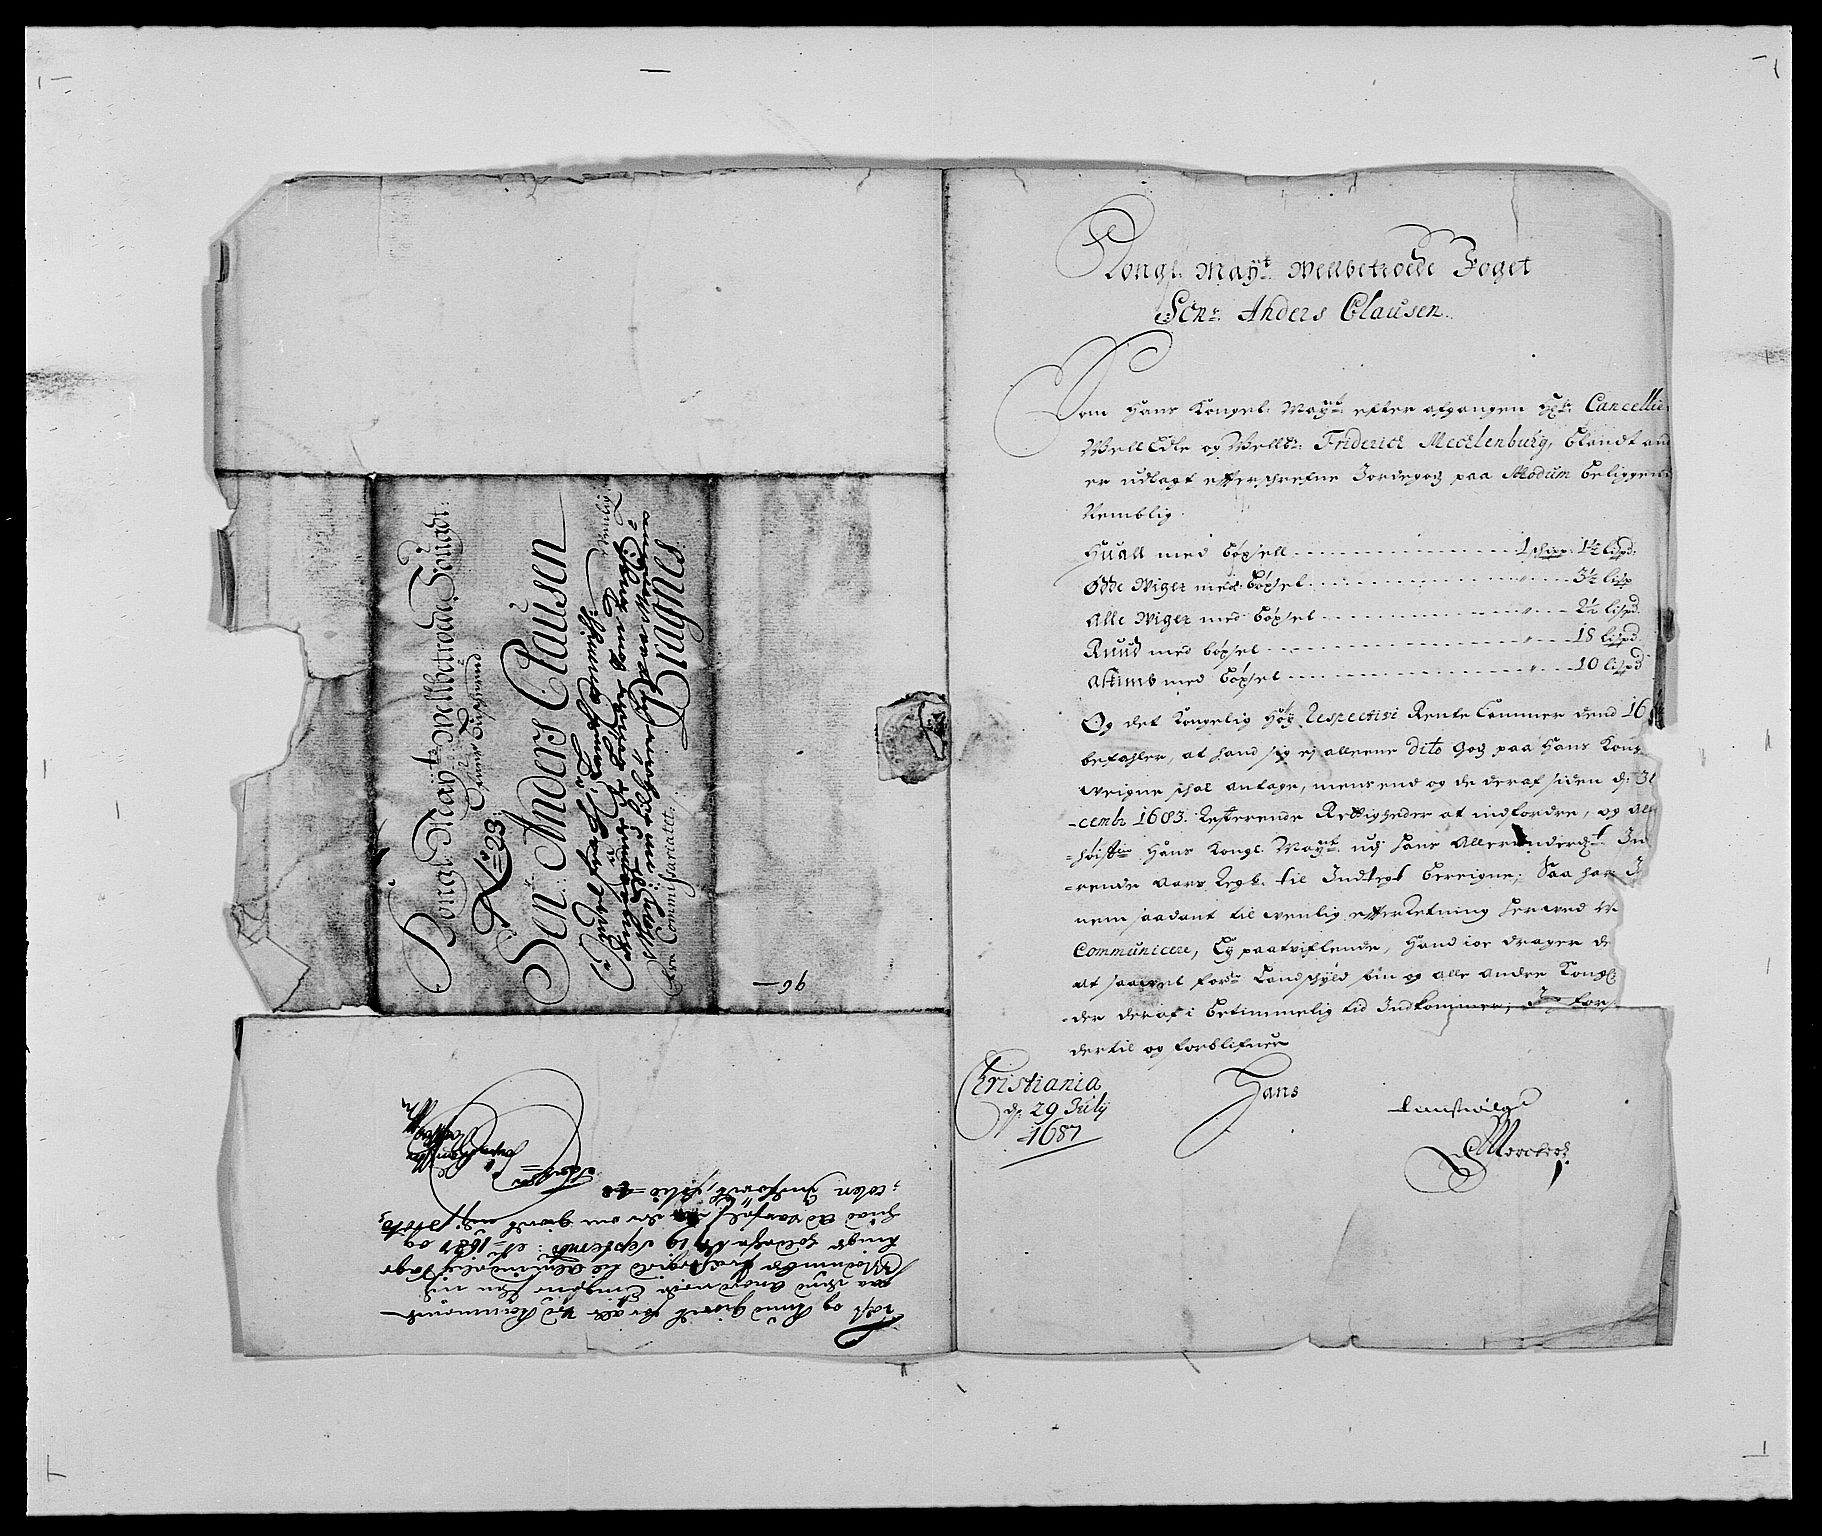 RA, Rentekammeret inntil 1814, Reviderte regnskaper, Fogderegnskap, R25/L1679: Fogderegnskap Buskerud, 1687-1688, s. 13